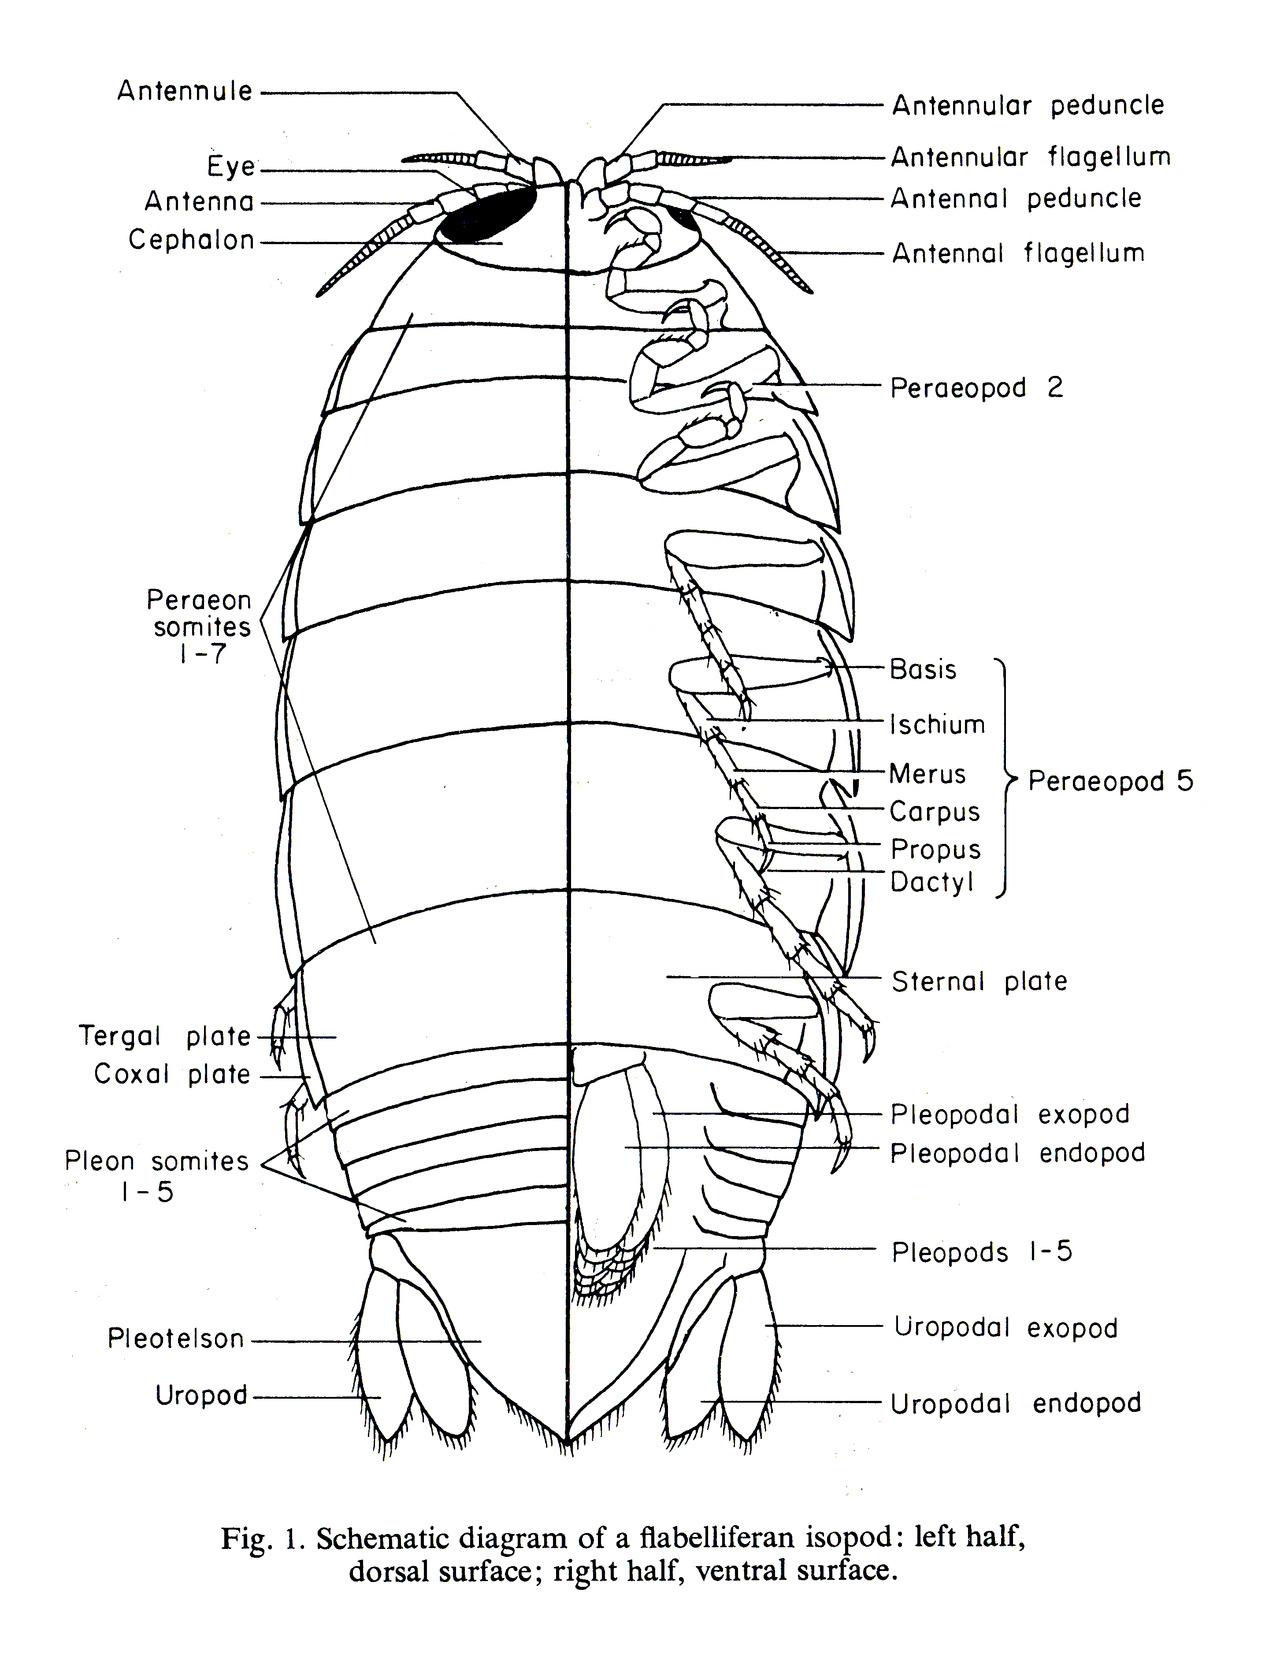 opossum skeleton diagram f2 molecular orbital pill bug anatomy related keywords long